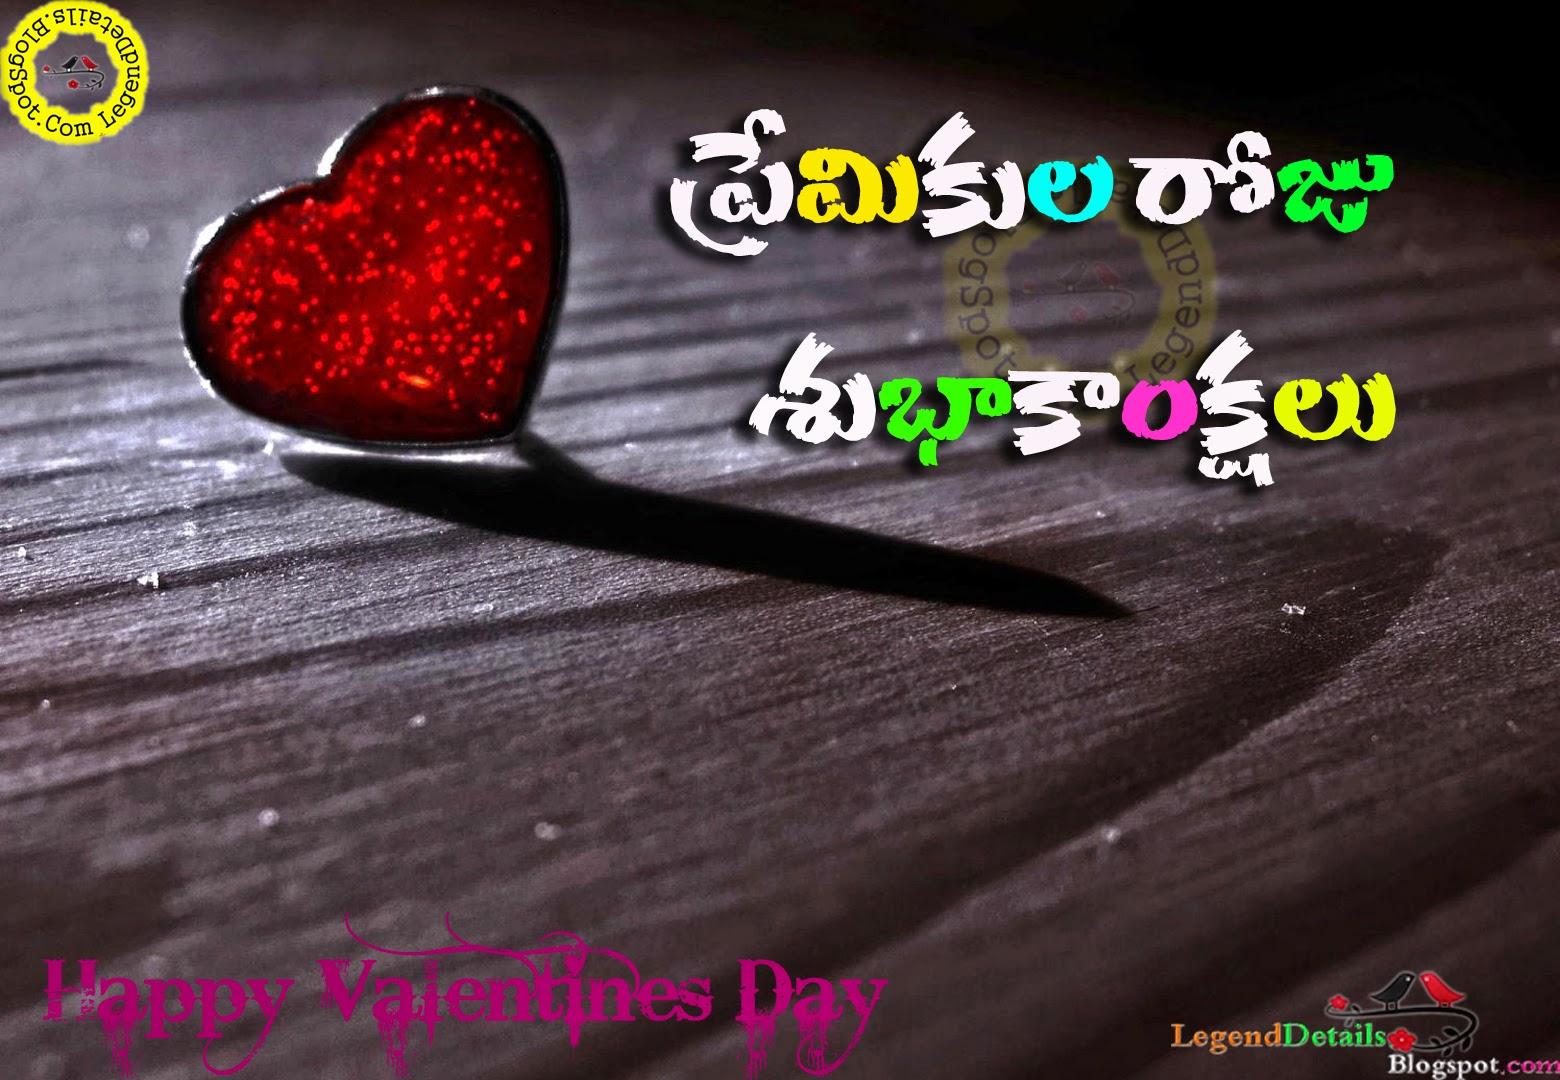 Valentines day wishes in telugu premikula roju subhakankshalu valentines day wishes in telugu premikula roju subhakankshalu telugu valentines day hd greetings valentines day telugu sms m4hsunfo